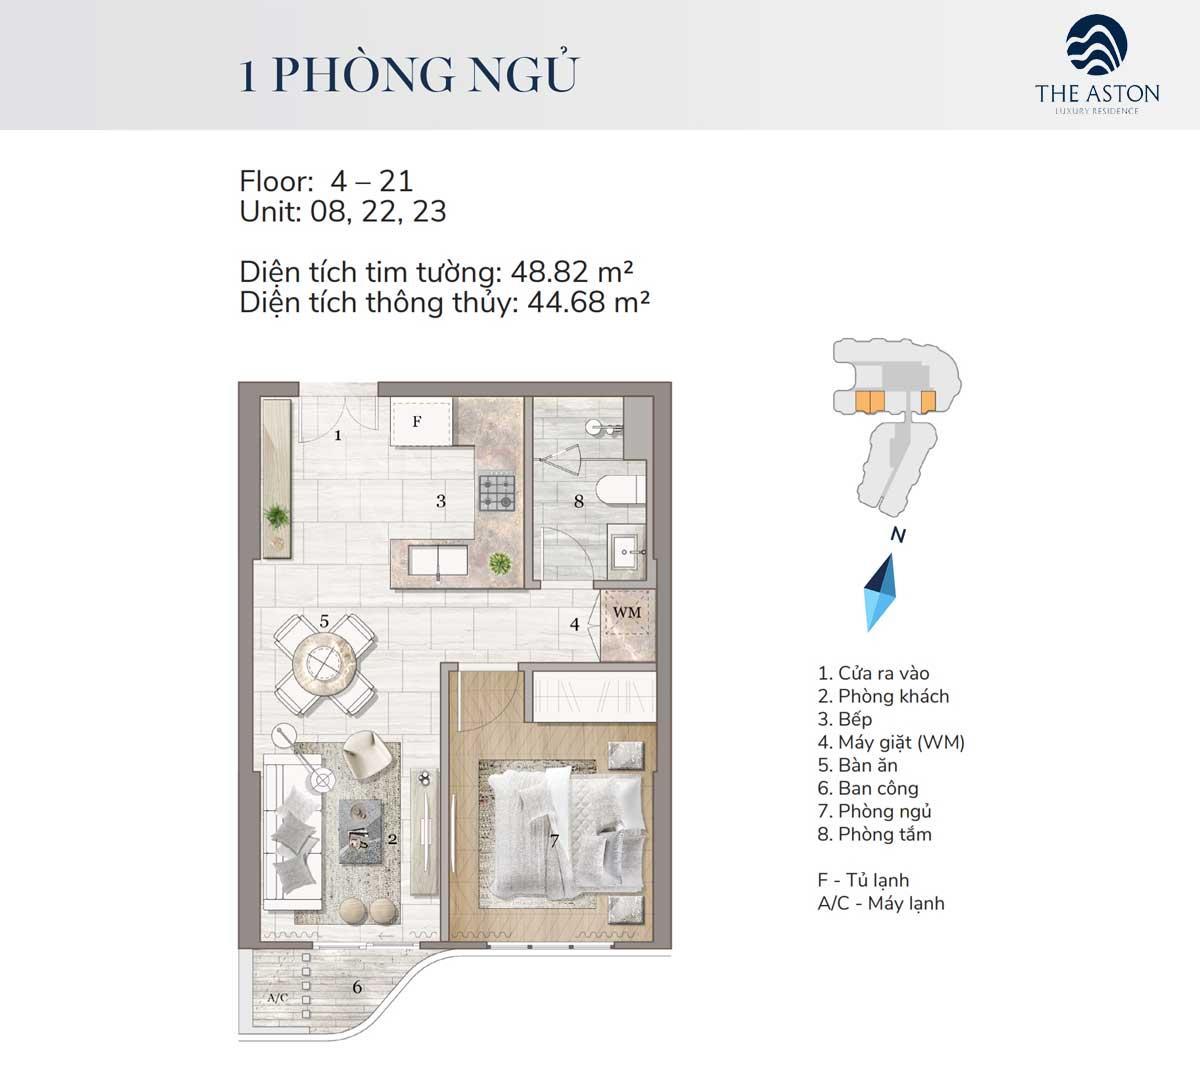 thiet ke can ho 1 phong ngu the aston luxury residence nha trang - THE ASTON LUXURY RESIDENCE NHA TRANG